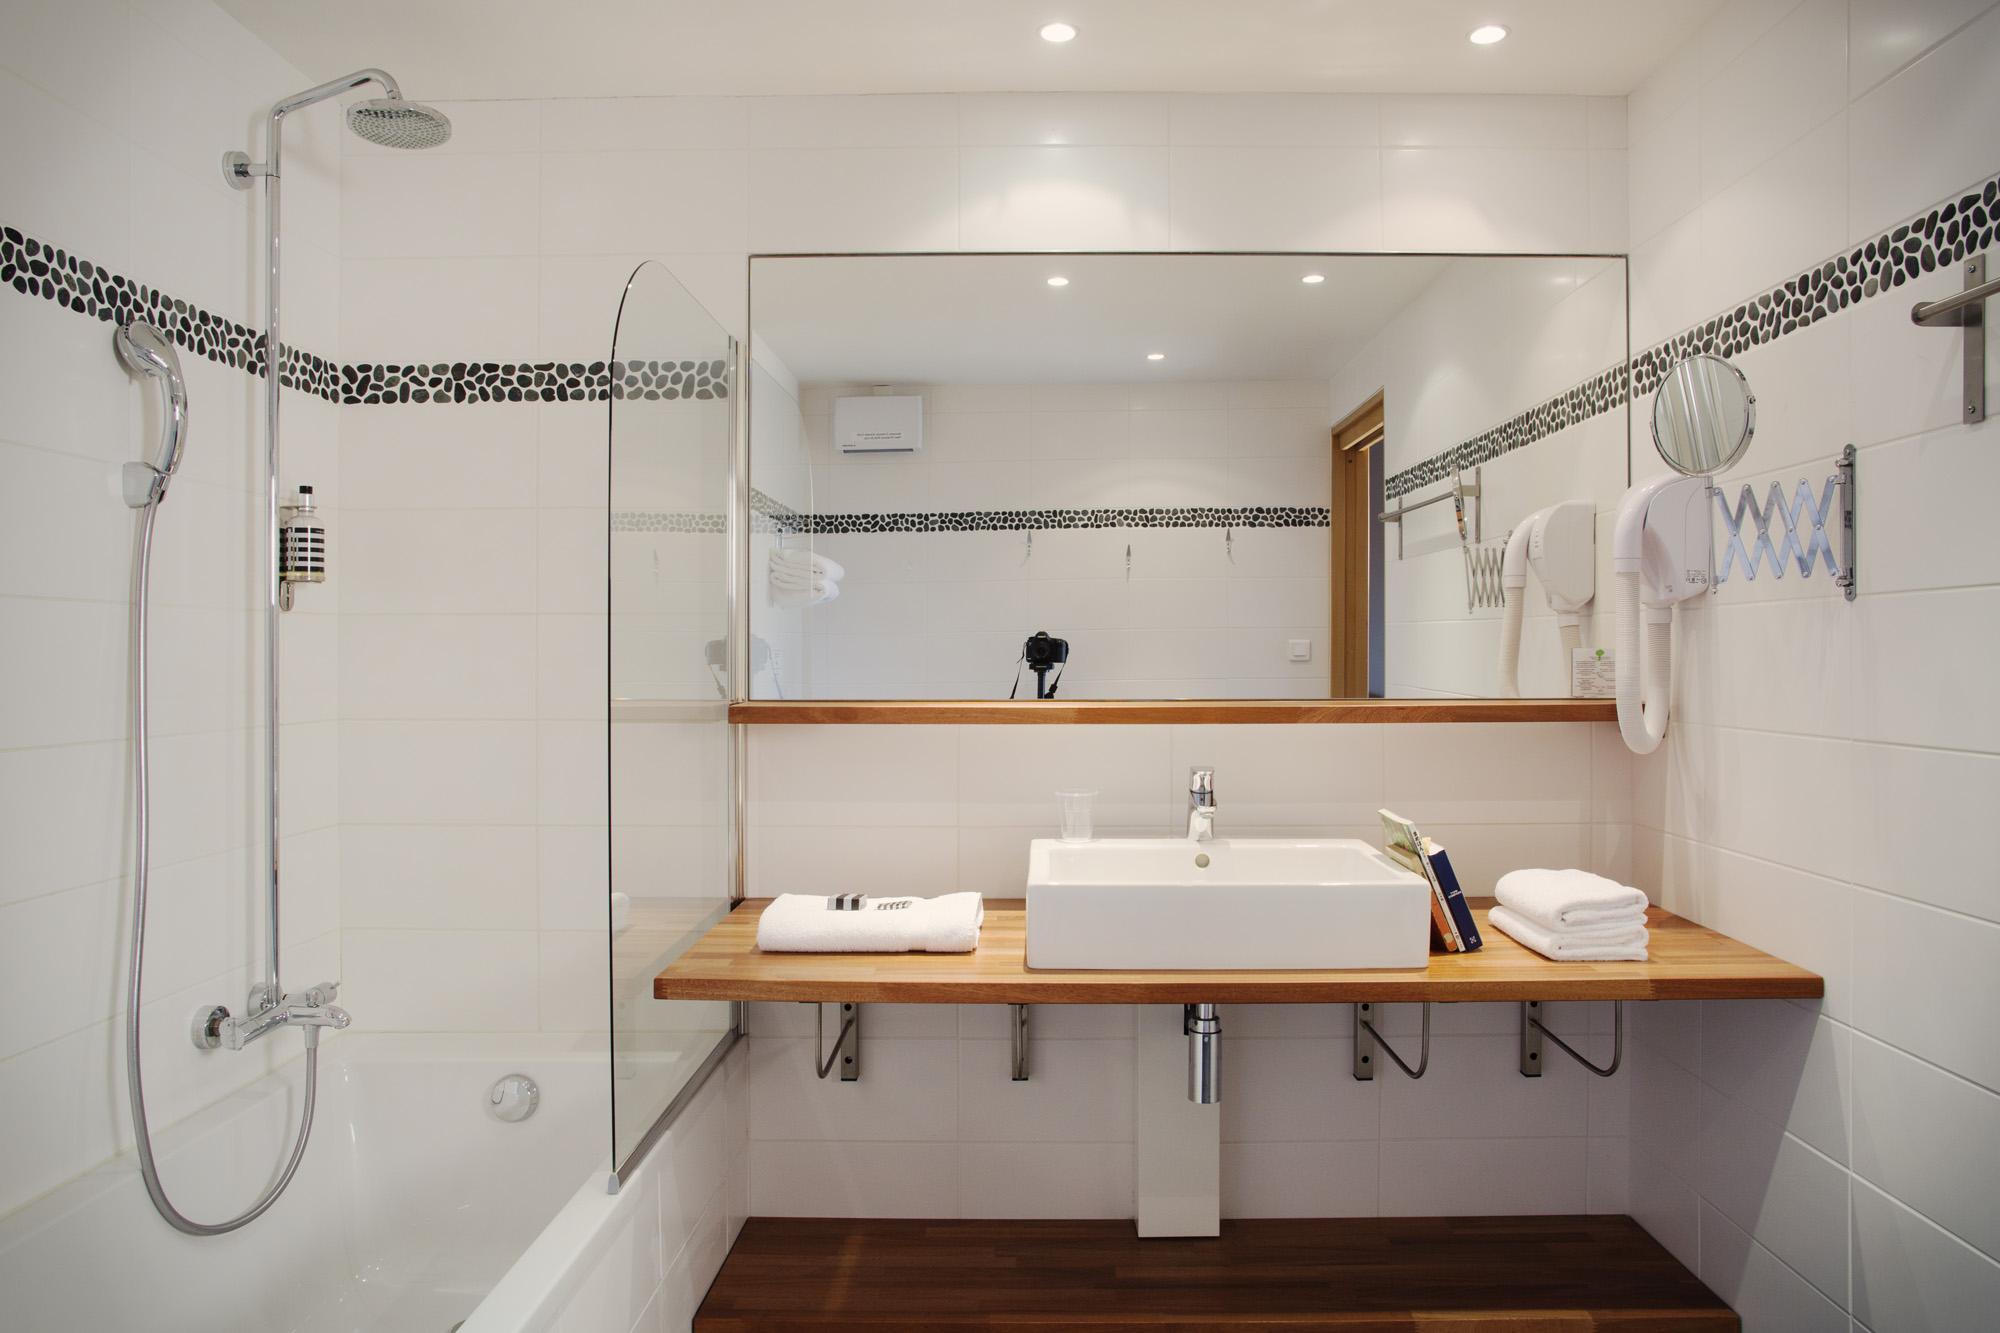 Salle de bain hotel les jardins d 39 hardelot for Salle bain hotel